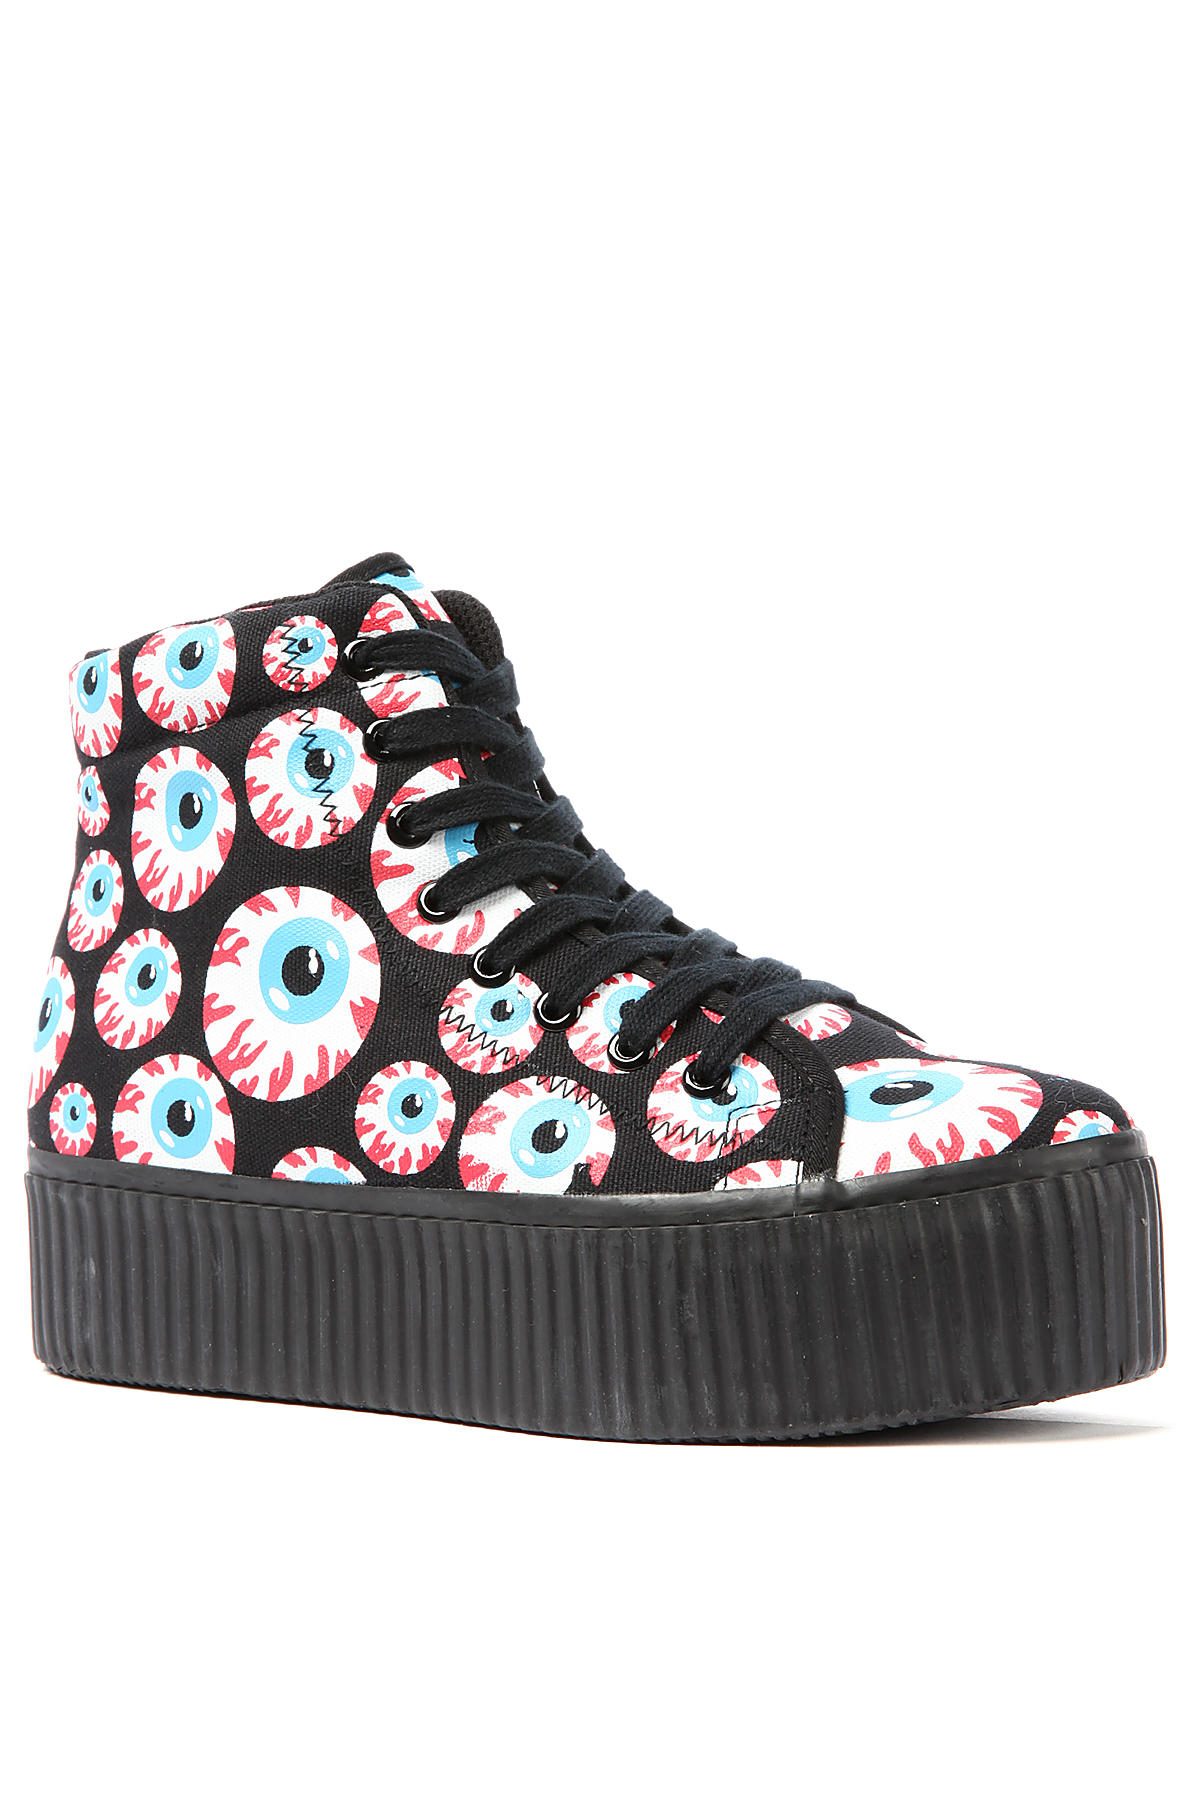 Jeffrey Campbell Sneakers Platform in Eyeballs Black